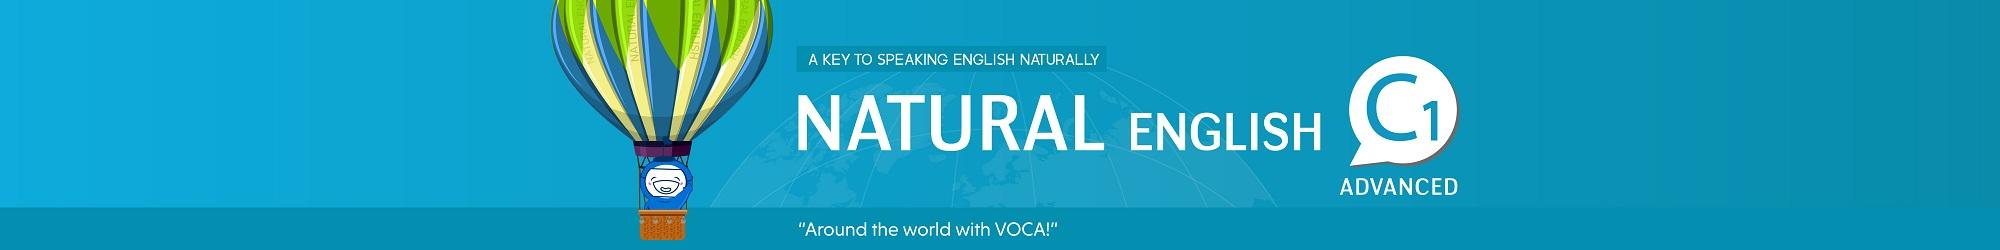 NATURAL ENGLISH C1 (2019) banner